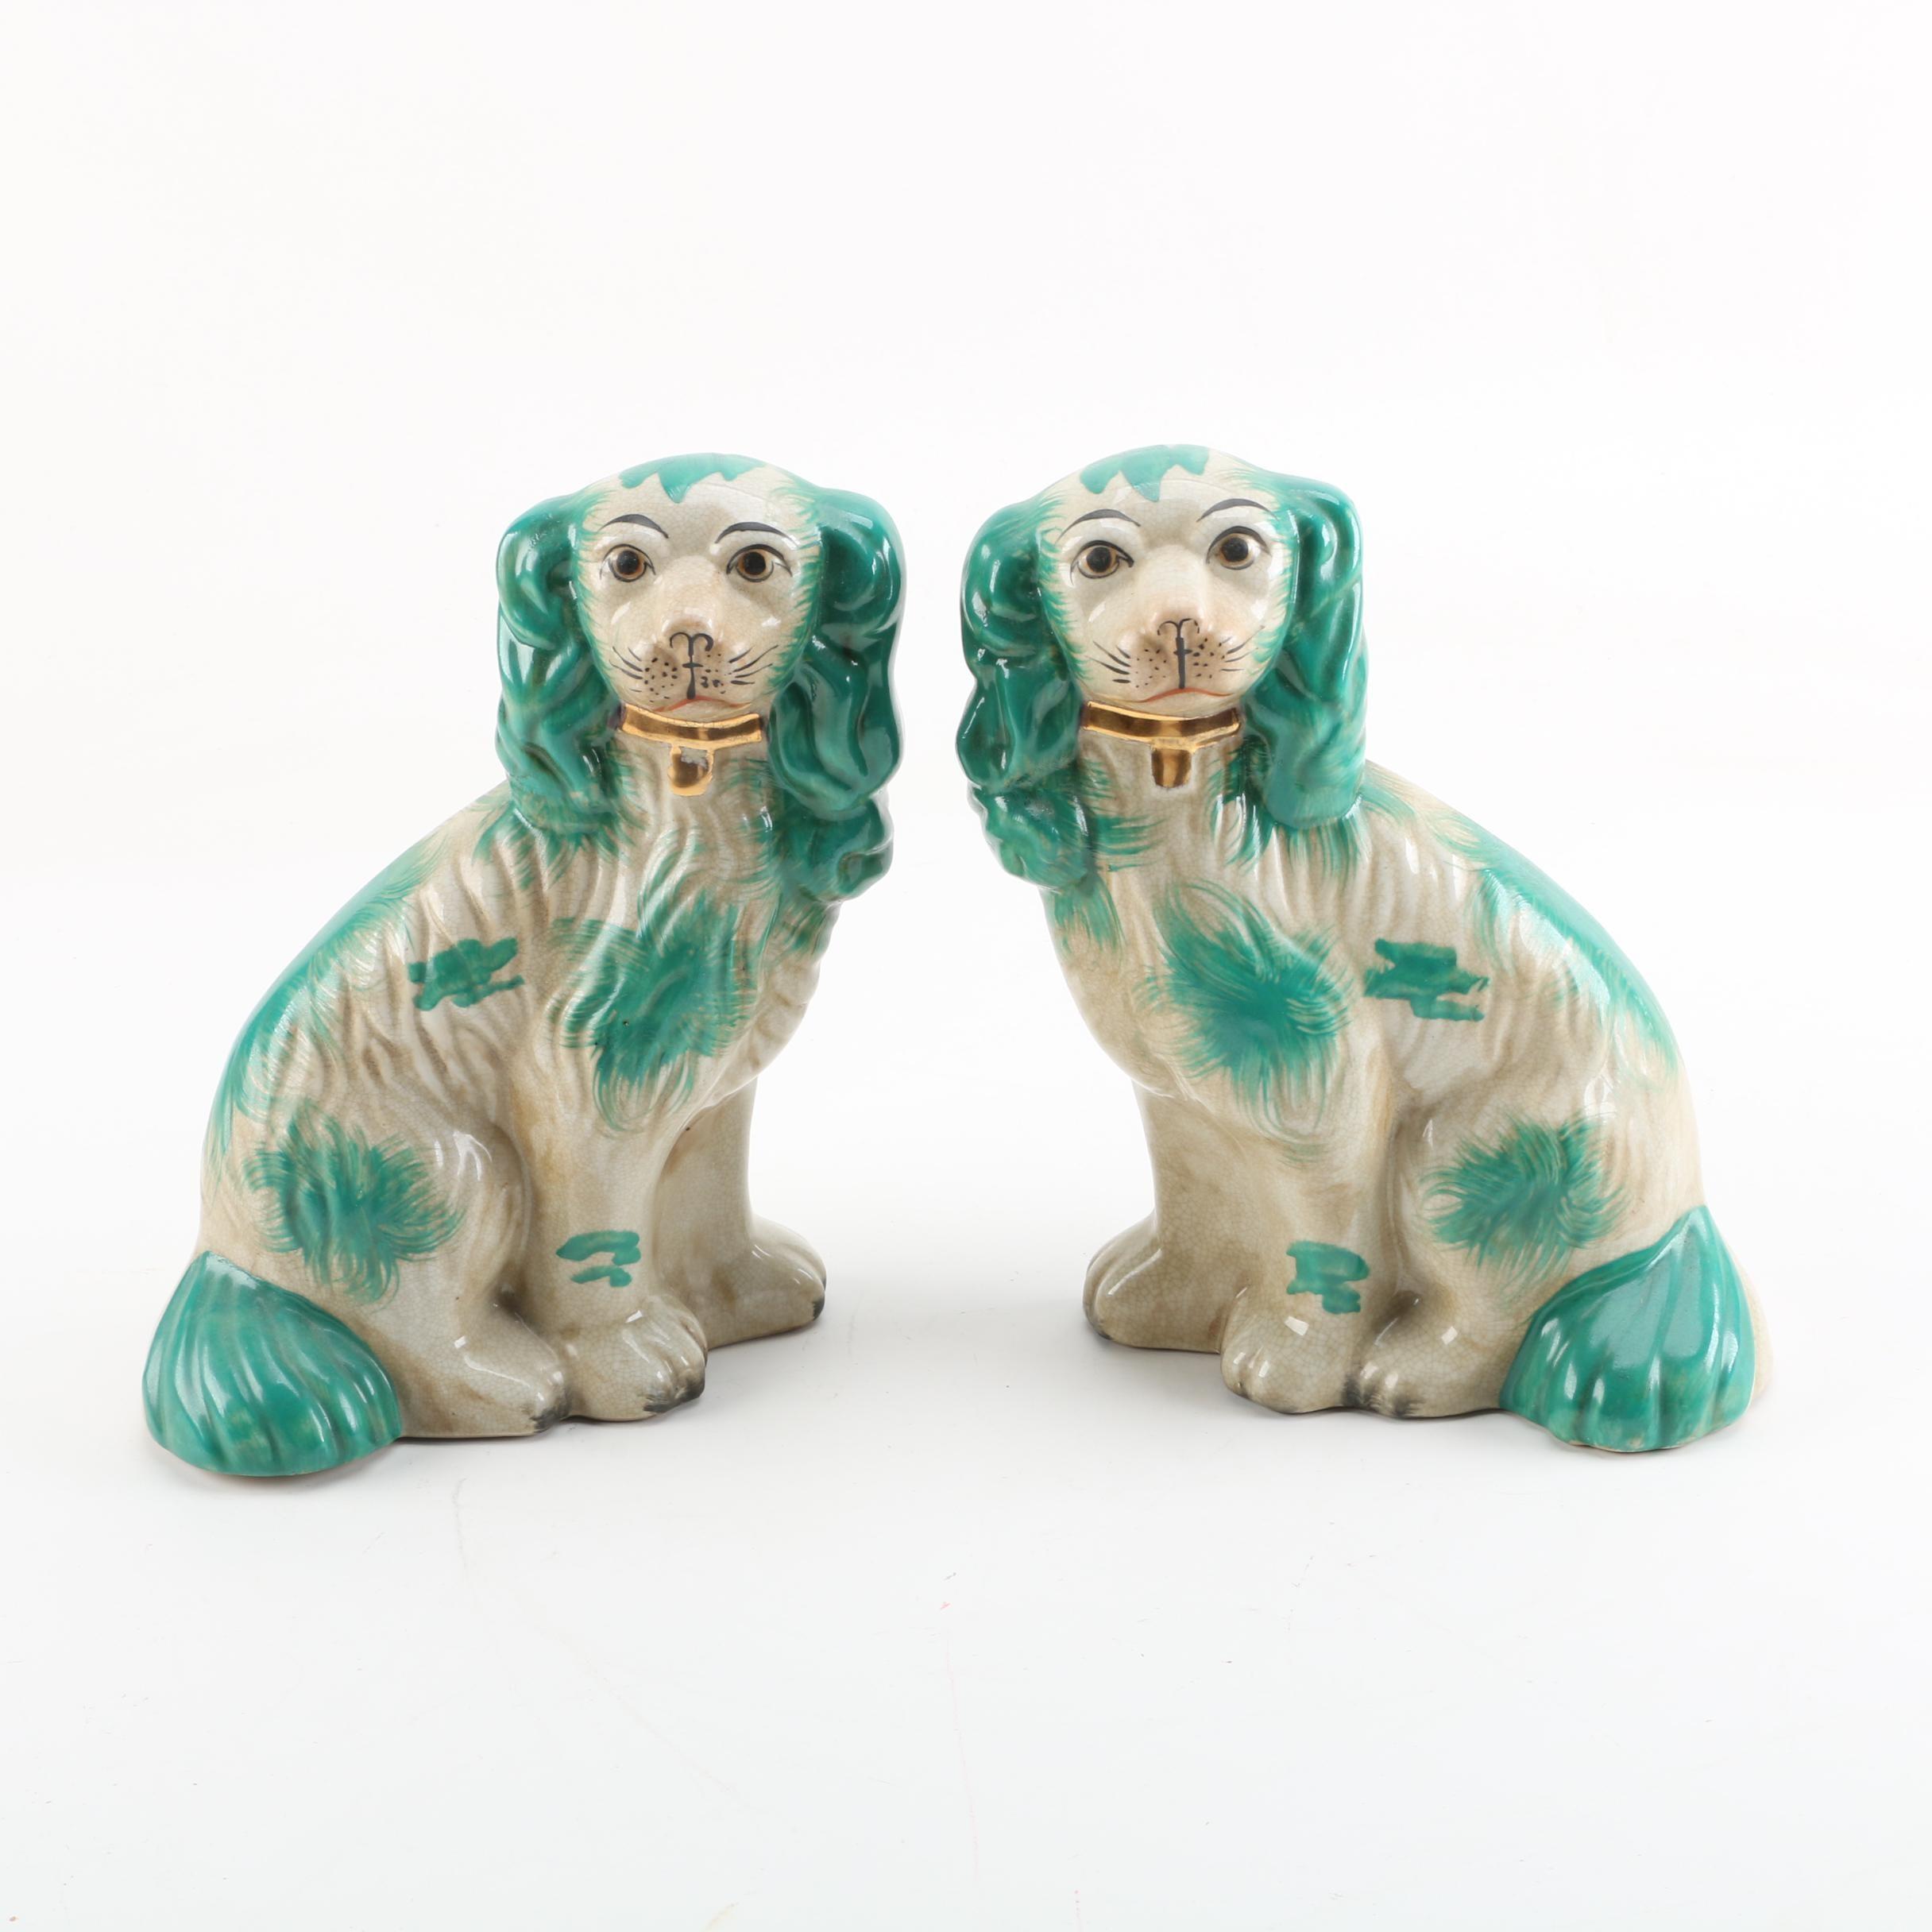 Staffordshire Style Ceramic Dog Figurines